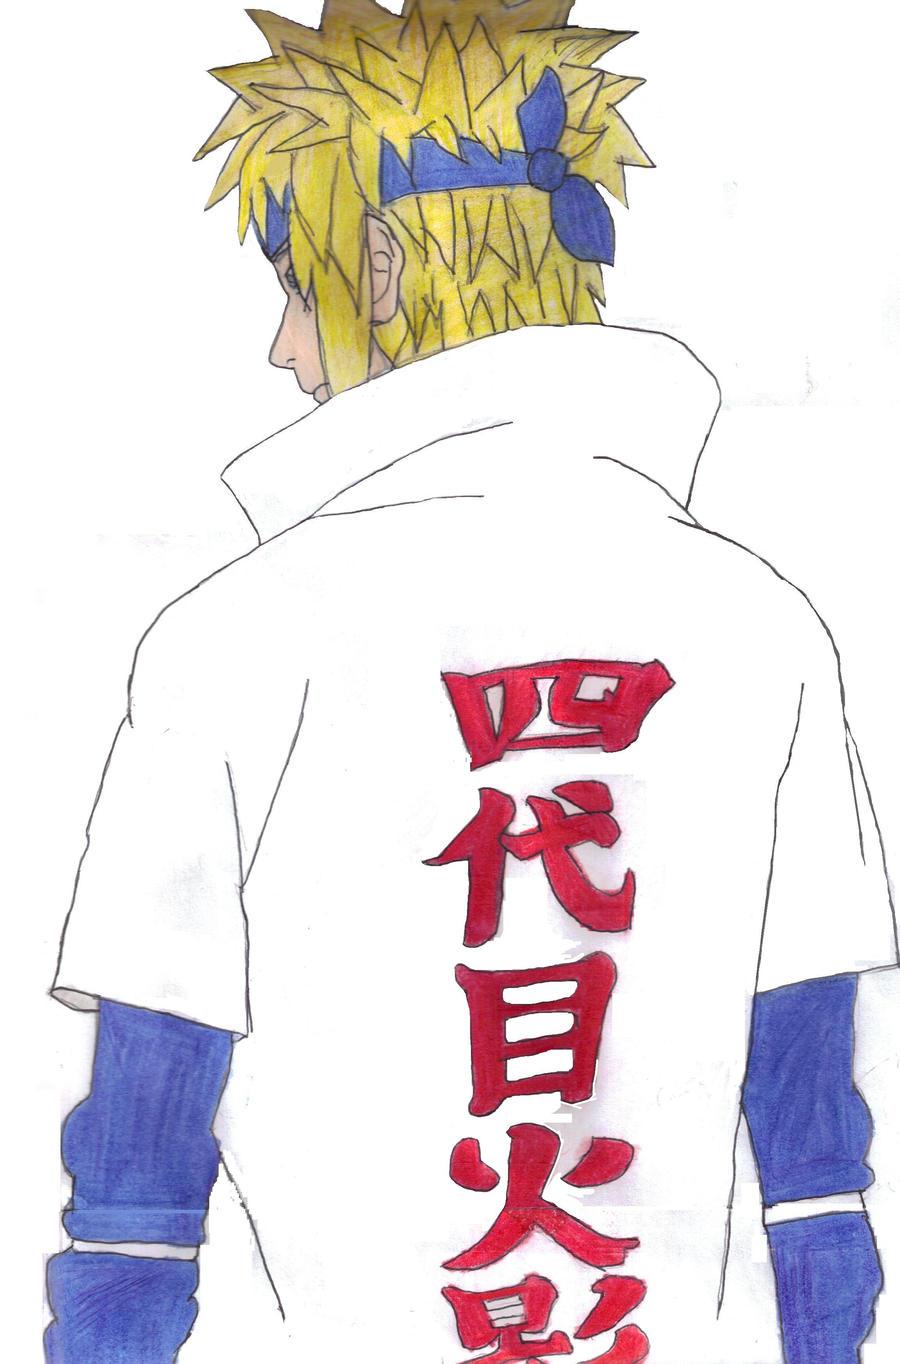 Minato: the Fourth Hokage by fifthknown on DeviantArt